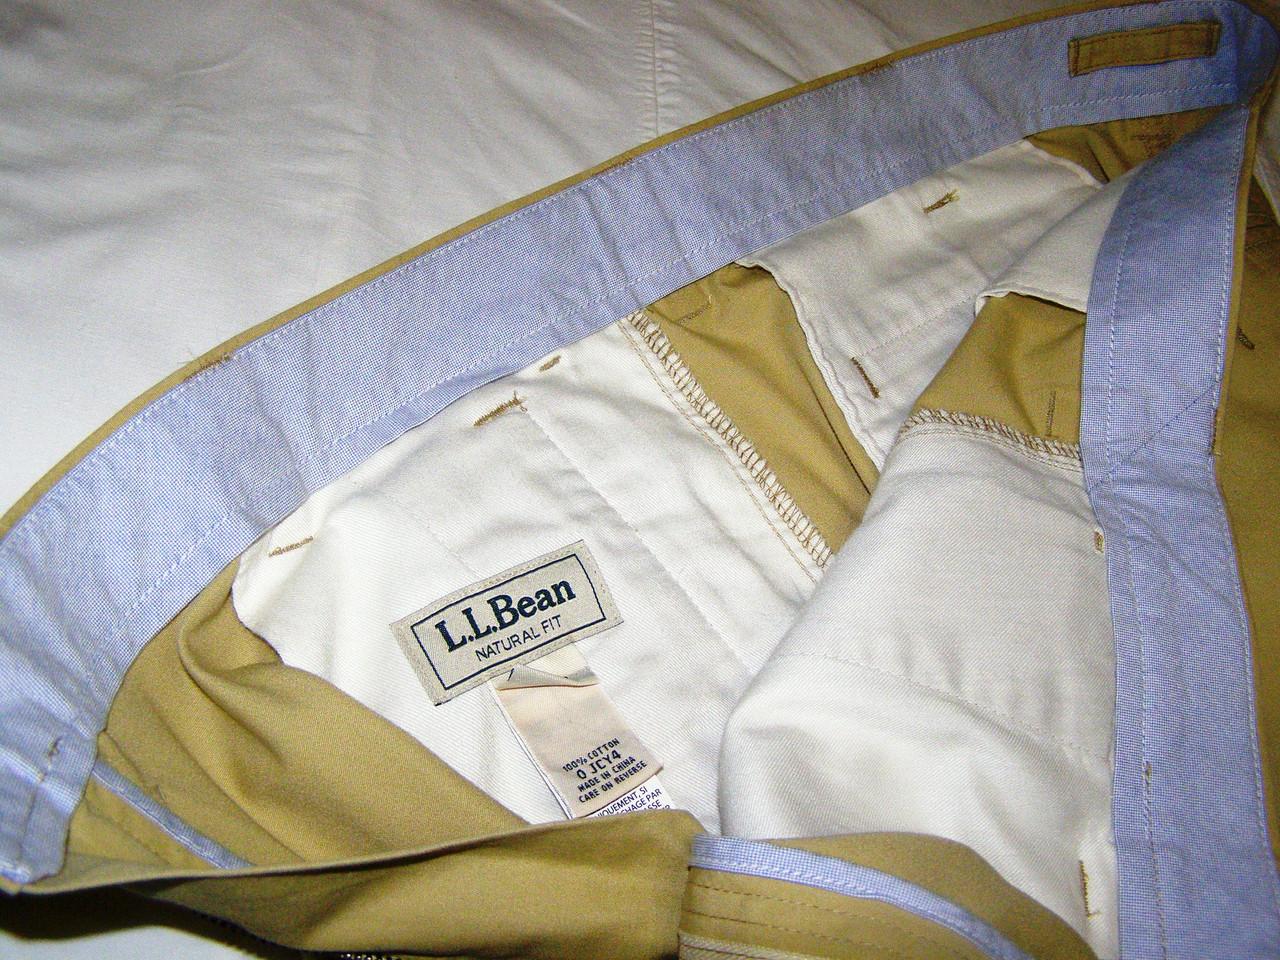 Штани L. L. Bean (52-54)